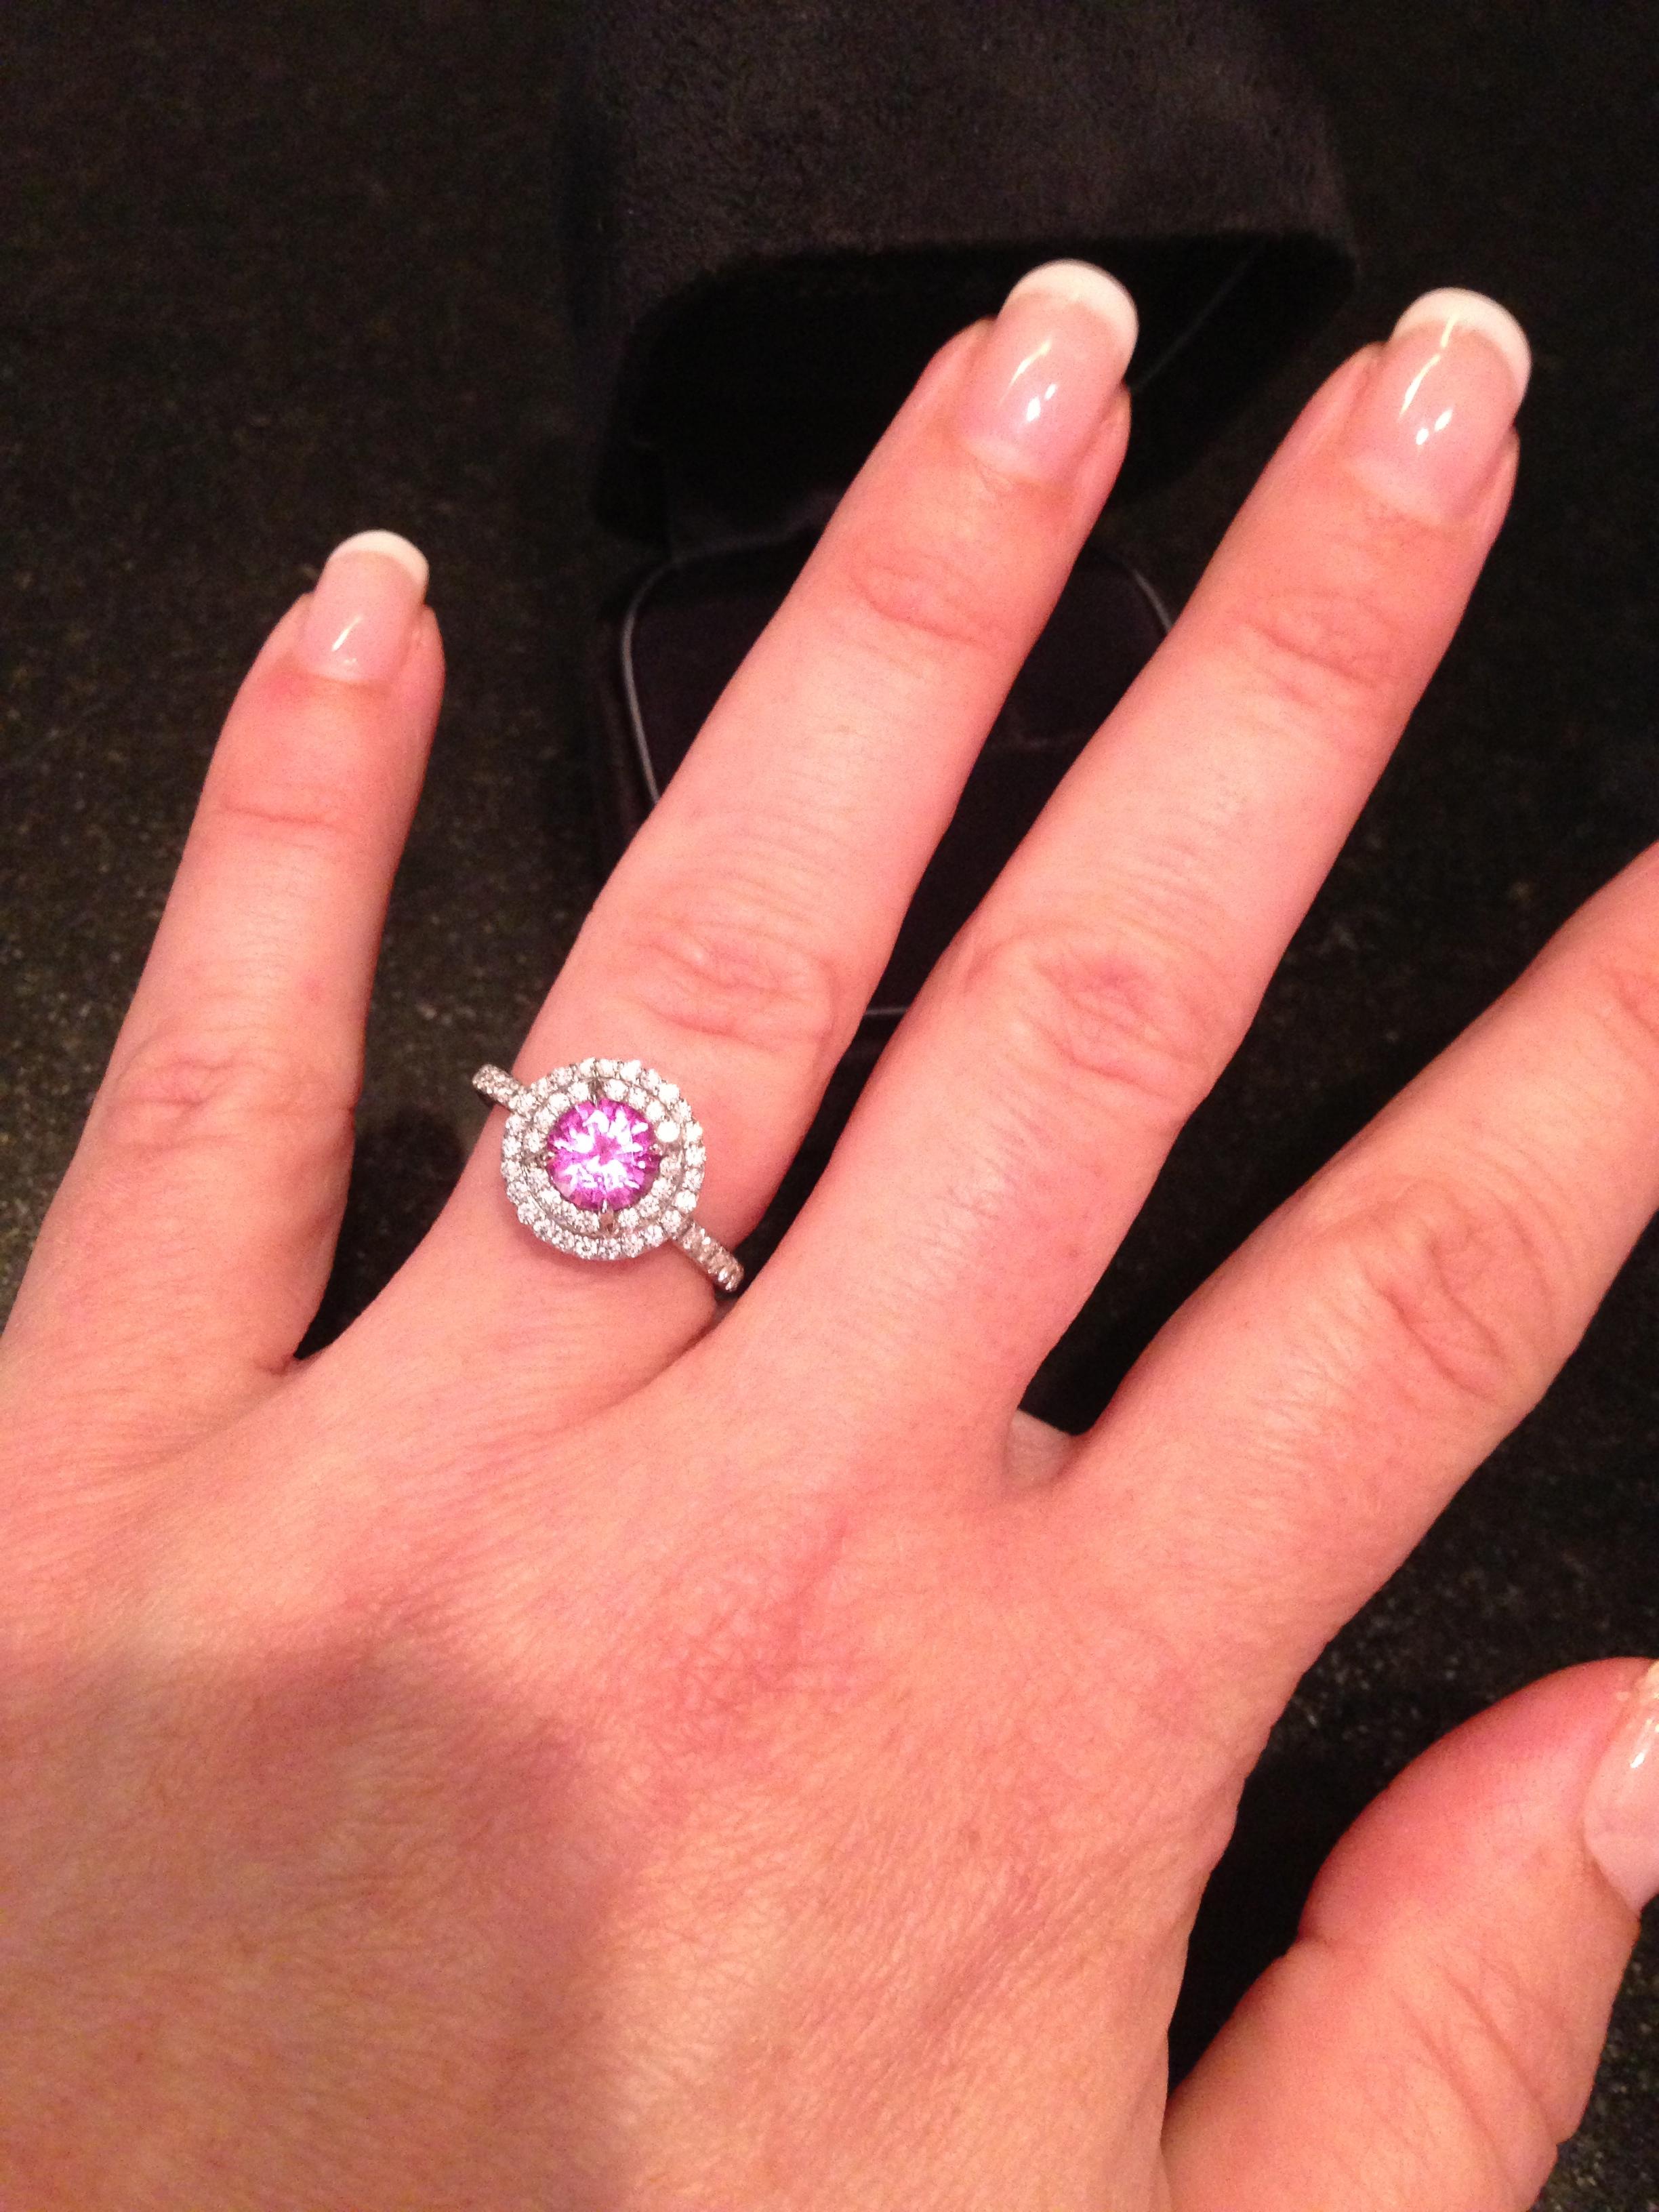 Elegant Tiffany 2.5 Carat Diamond Ring - Best Jewelry